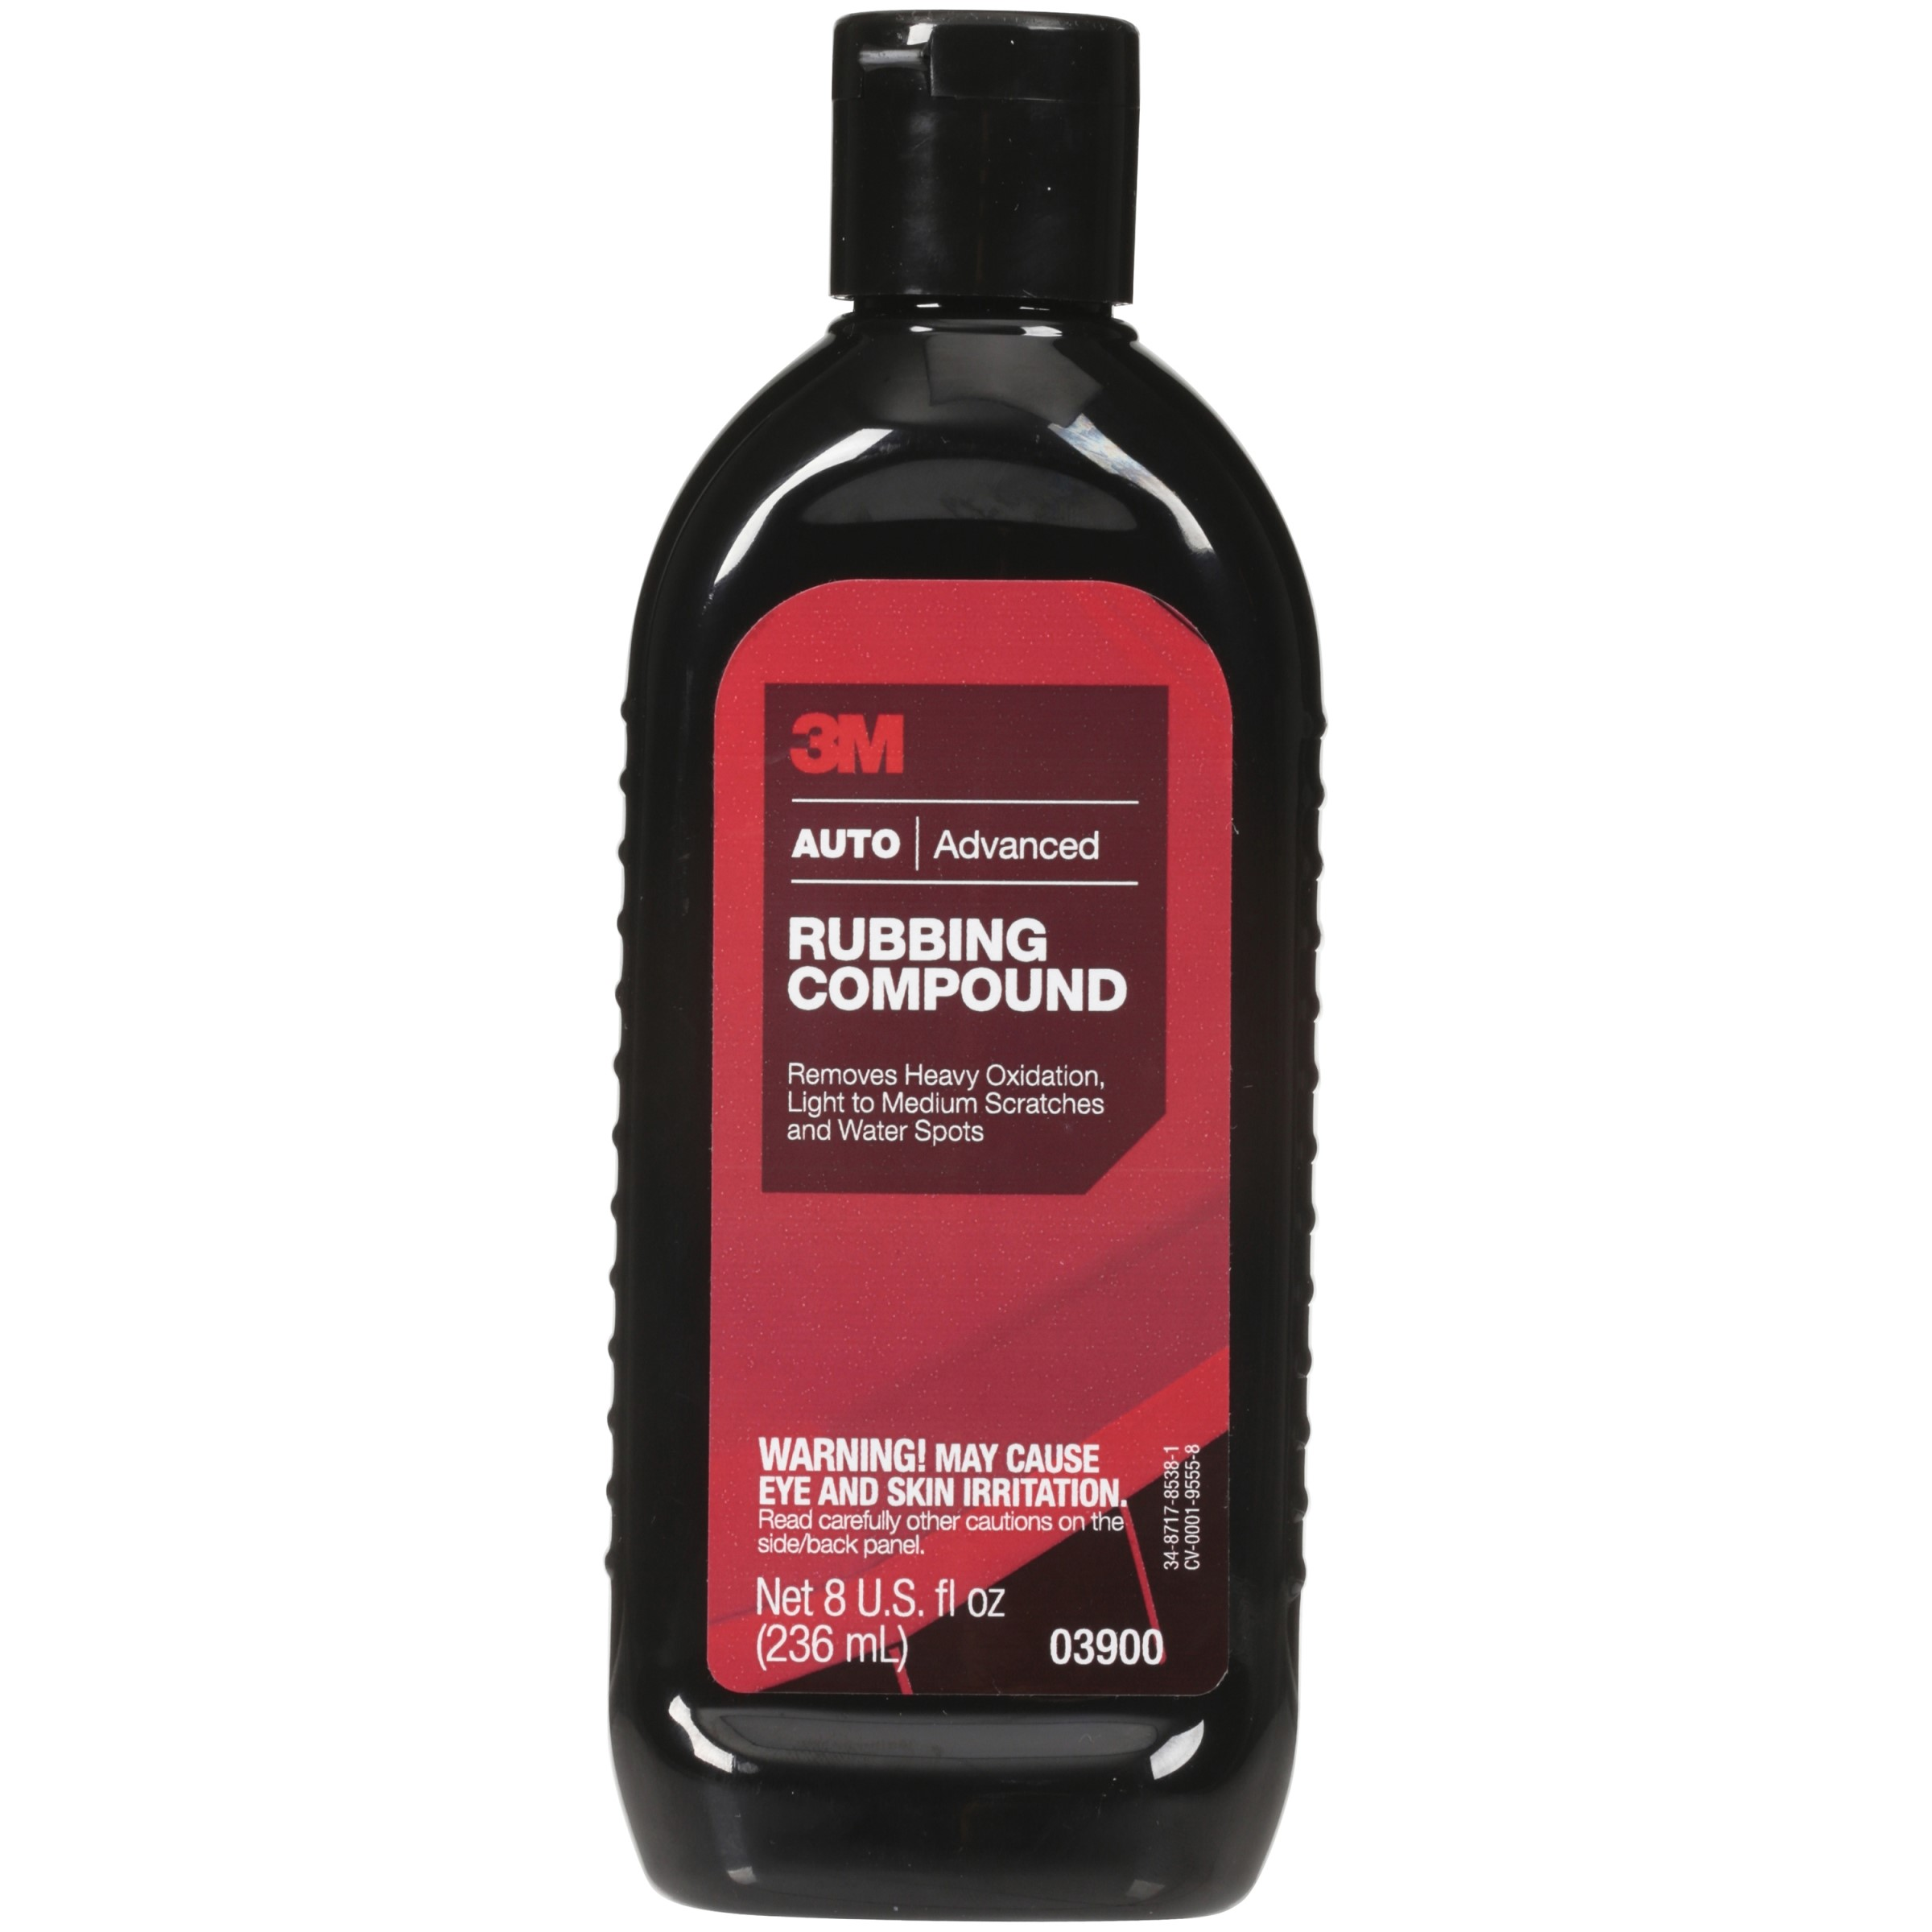 3M Auto Advanced Rubbing Compound 8 fl. oz. Bottle by 3M